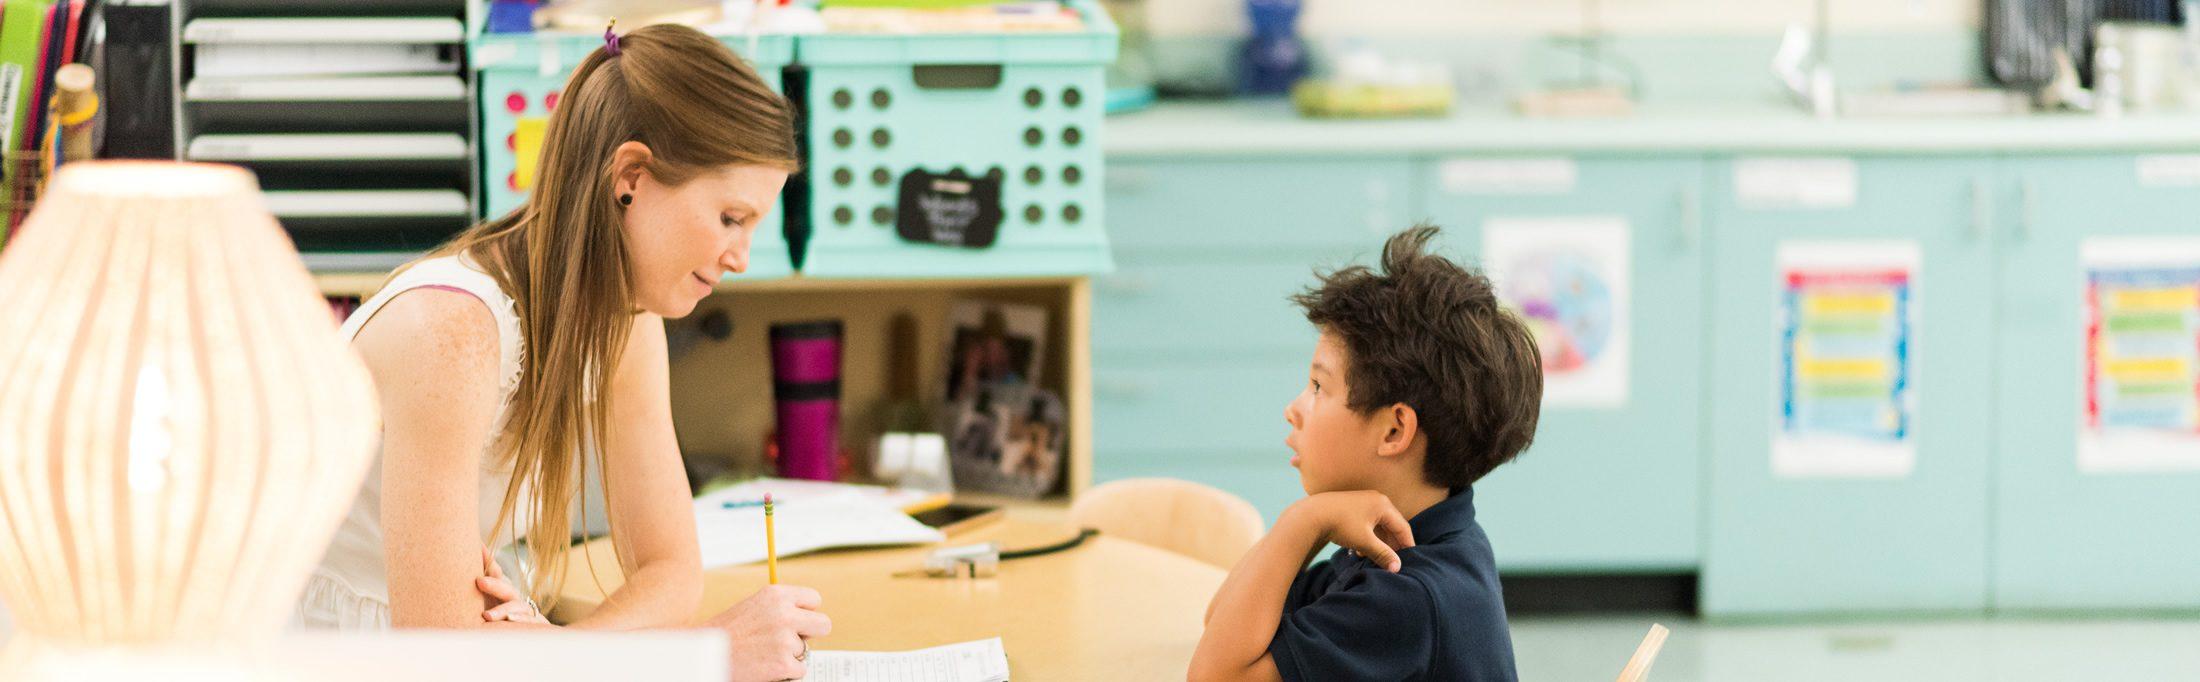 Teach and student